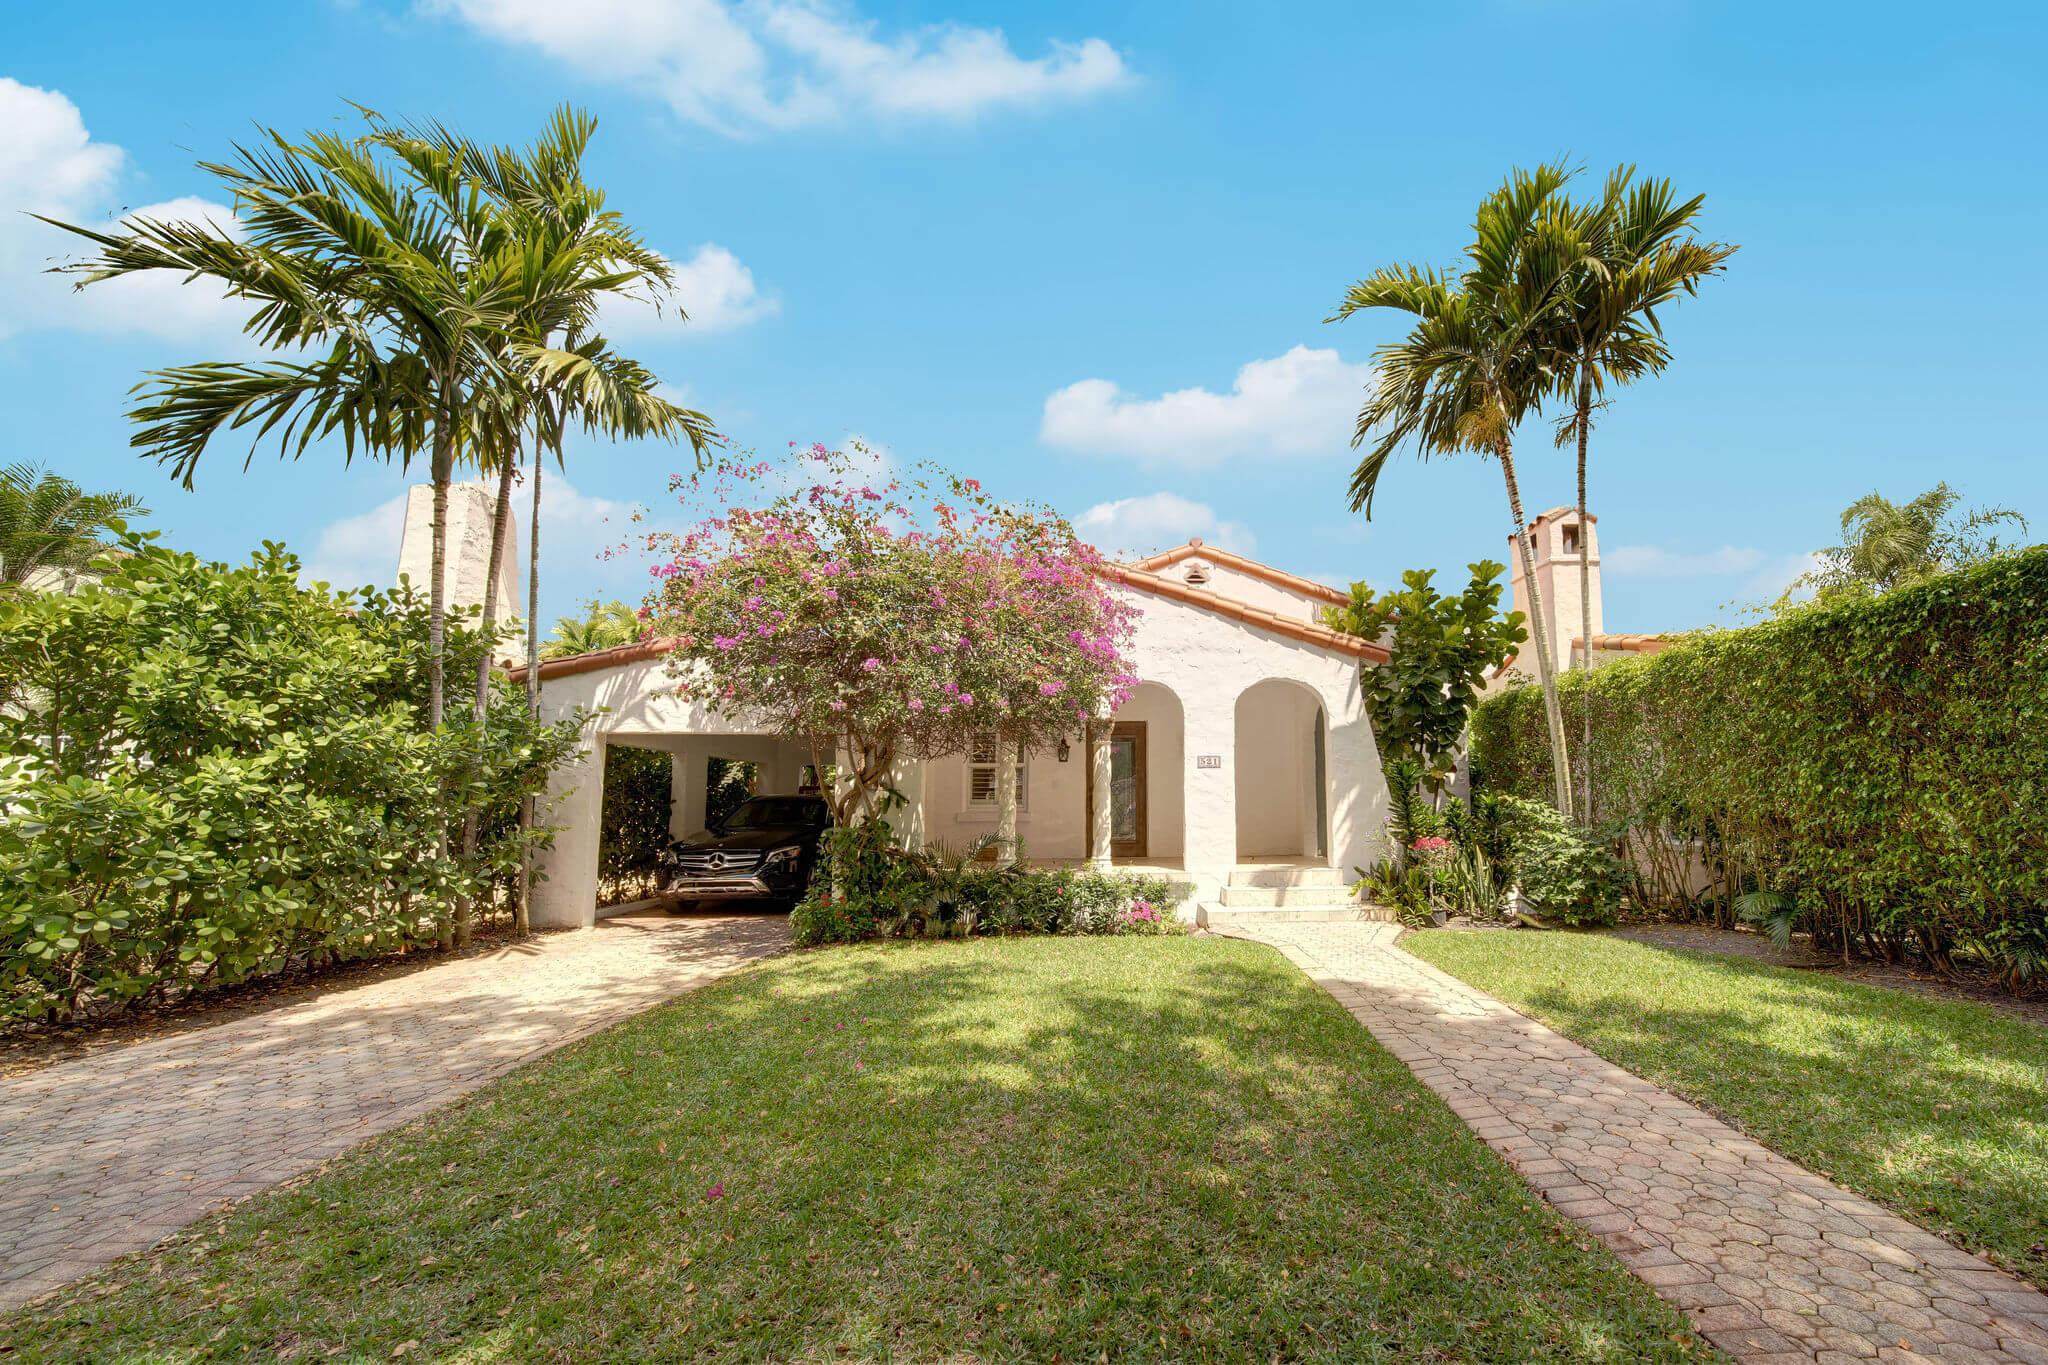 2__521_san_lorenzo_photo_by__MiamiRealEstatePhotographers.com